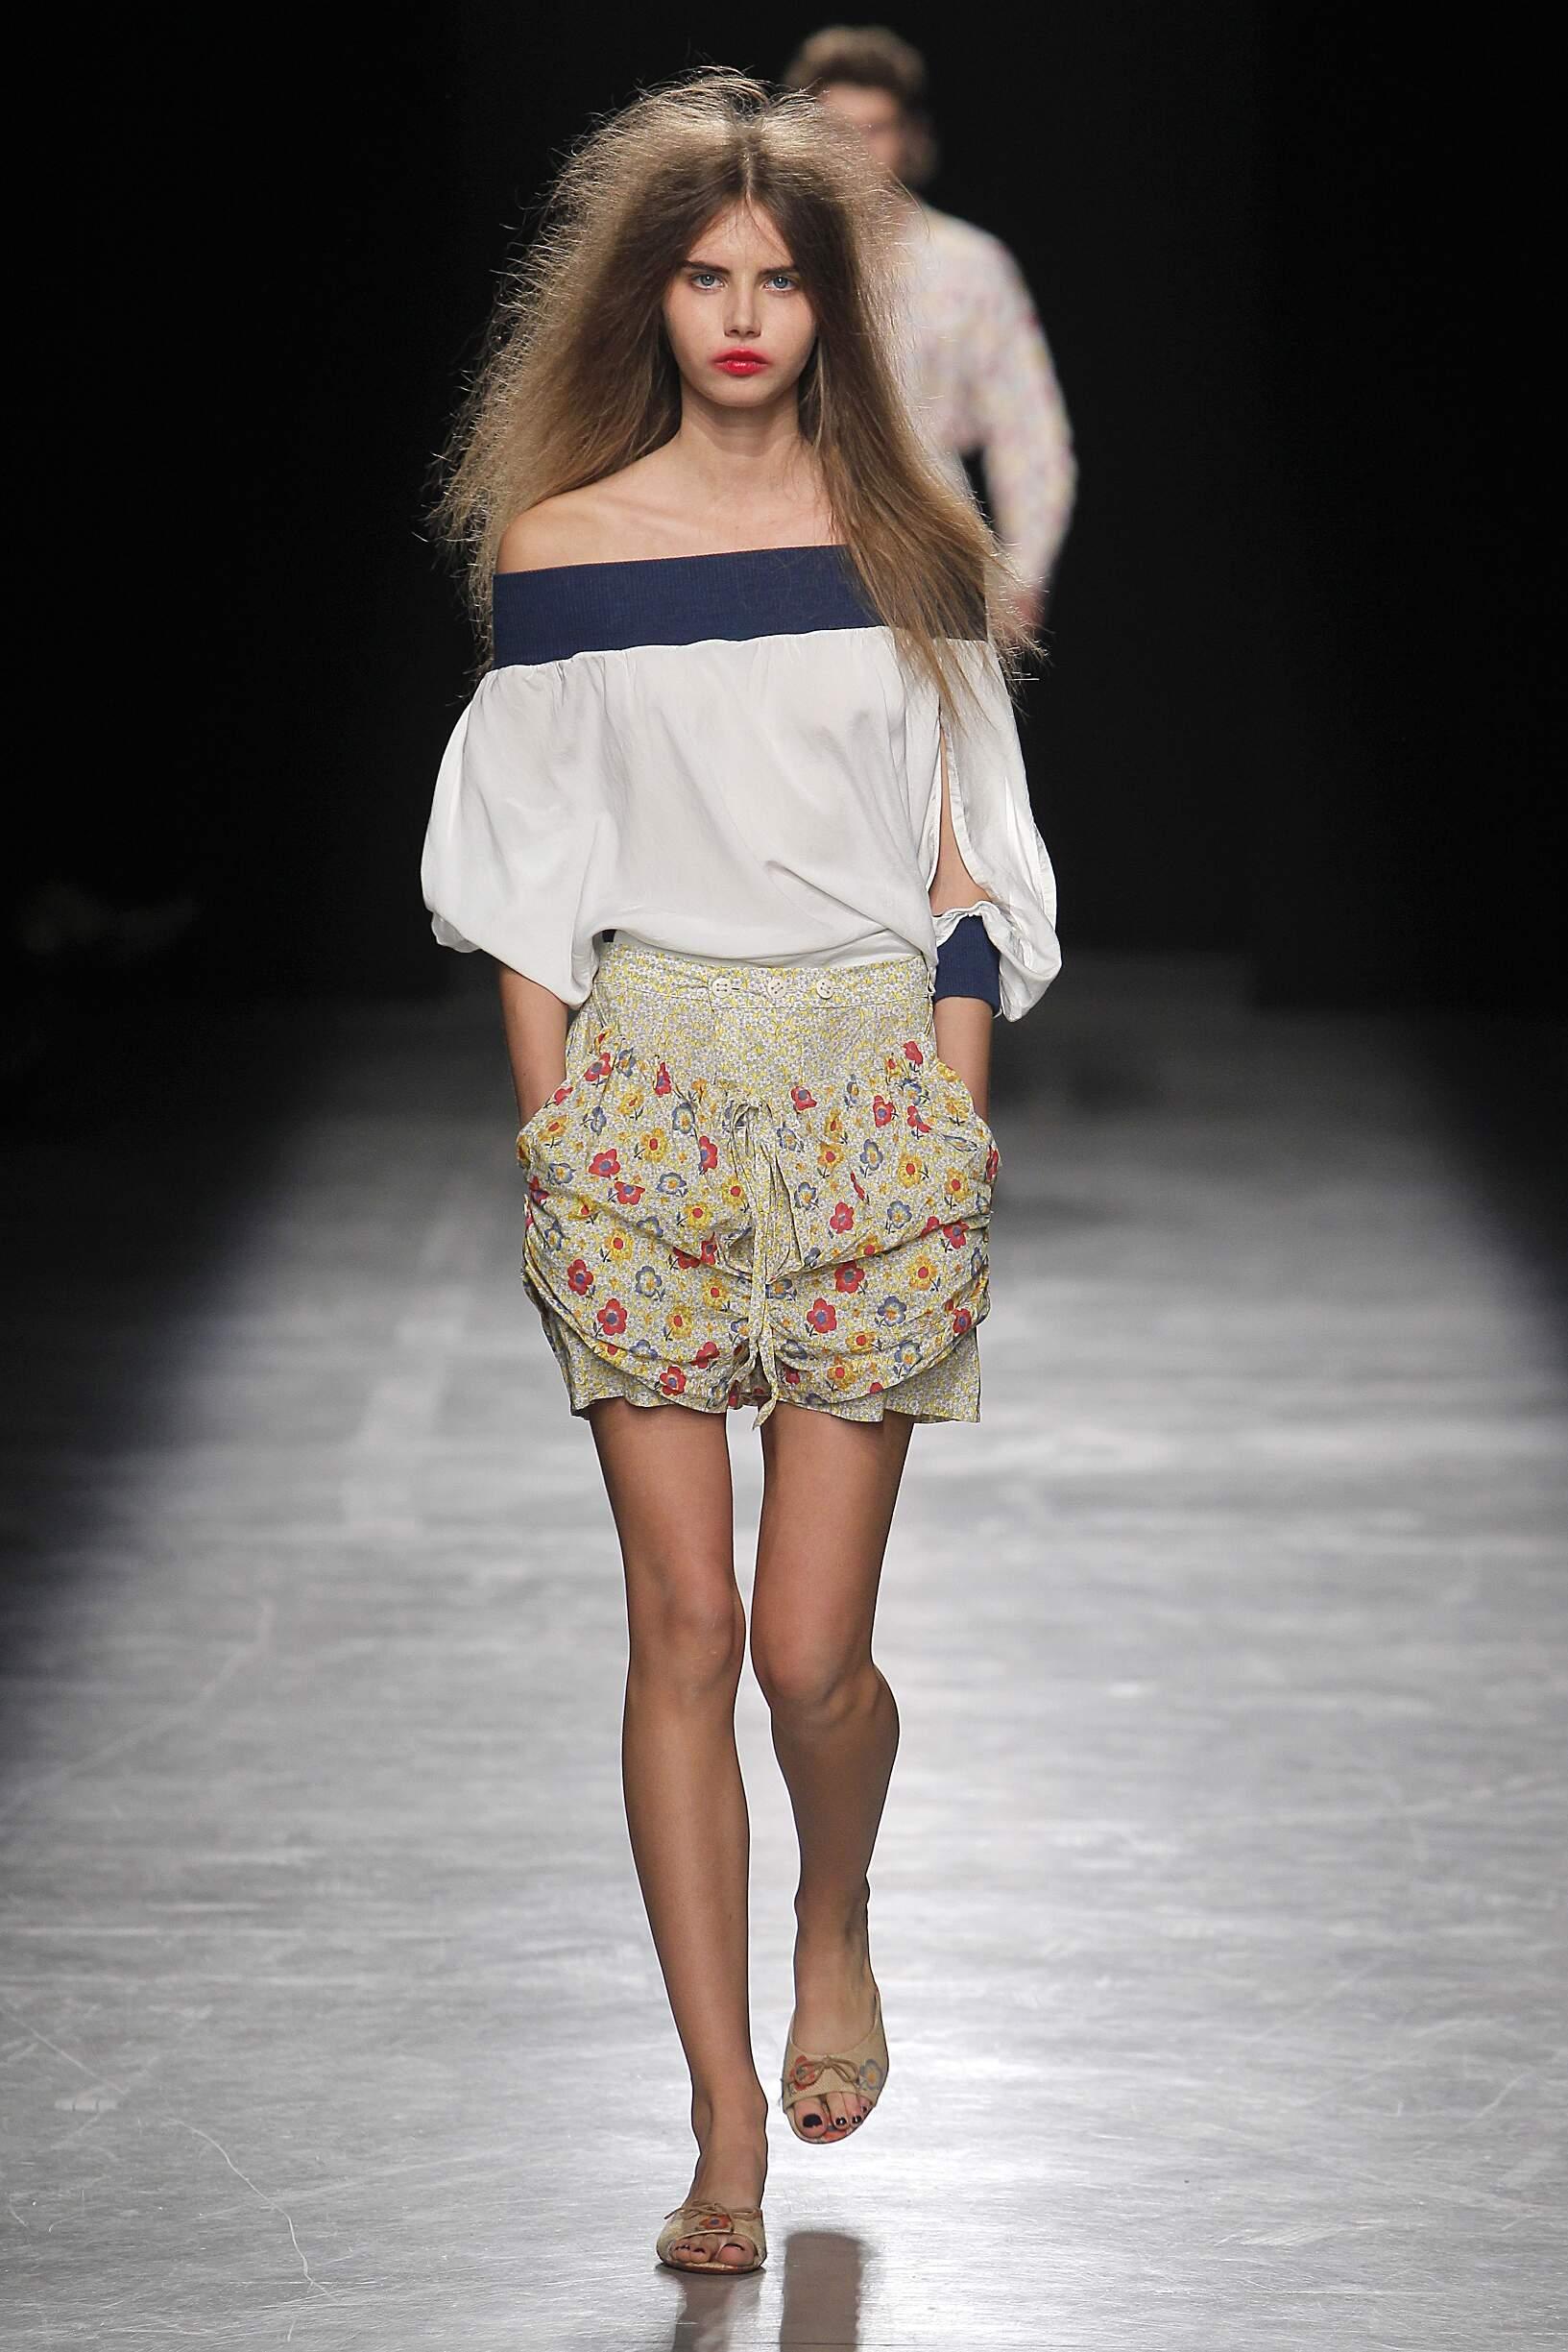 Model Fashion Show Andreas Kronthaler for Vivienne Westwood